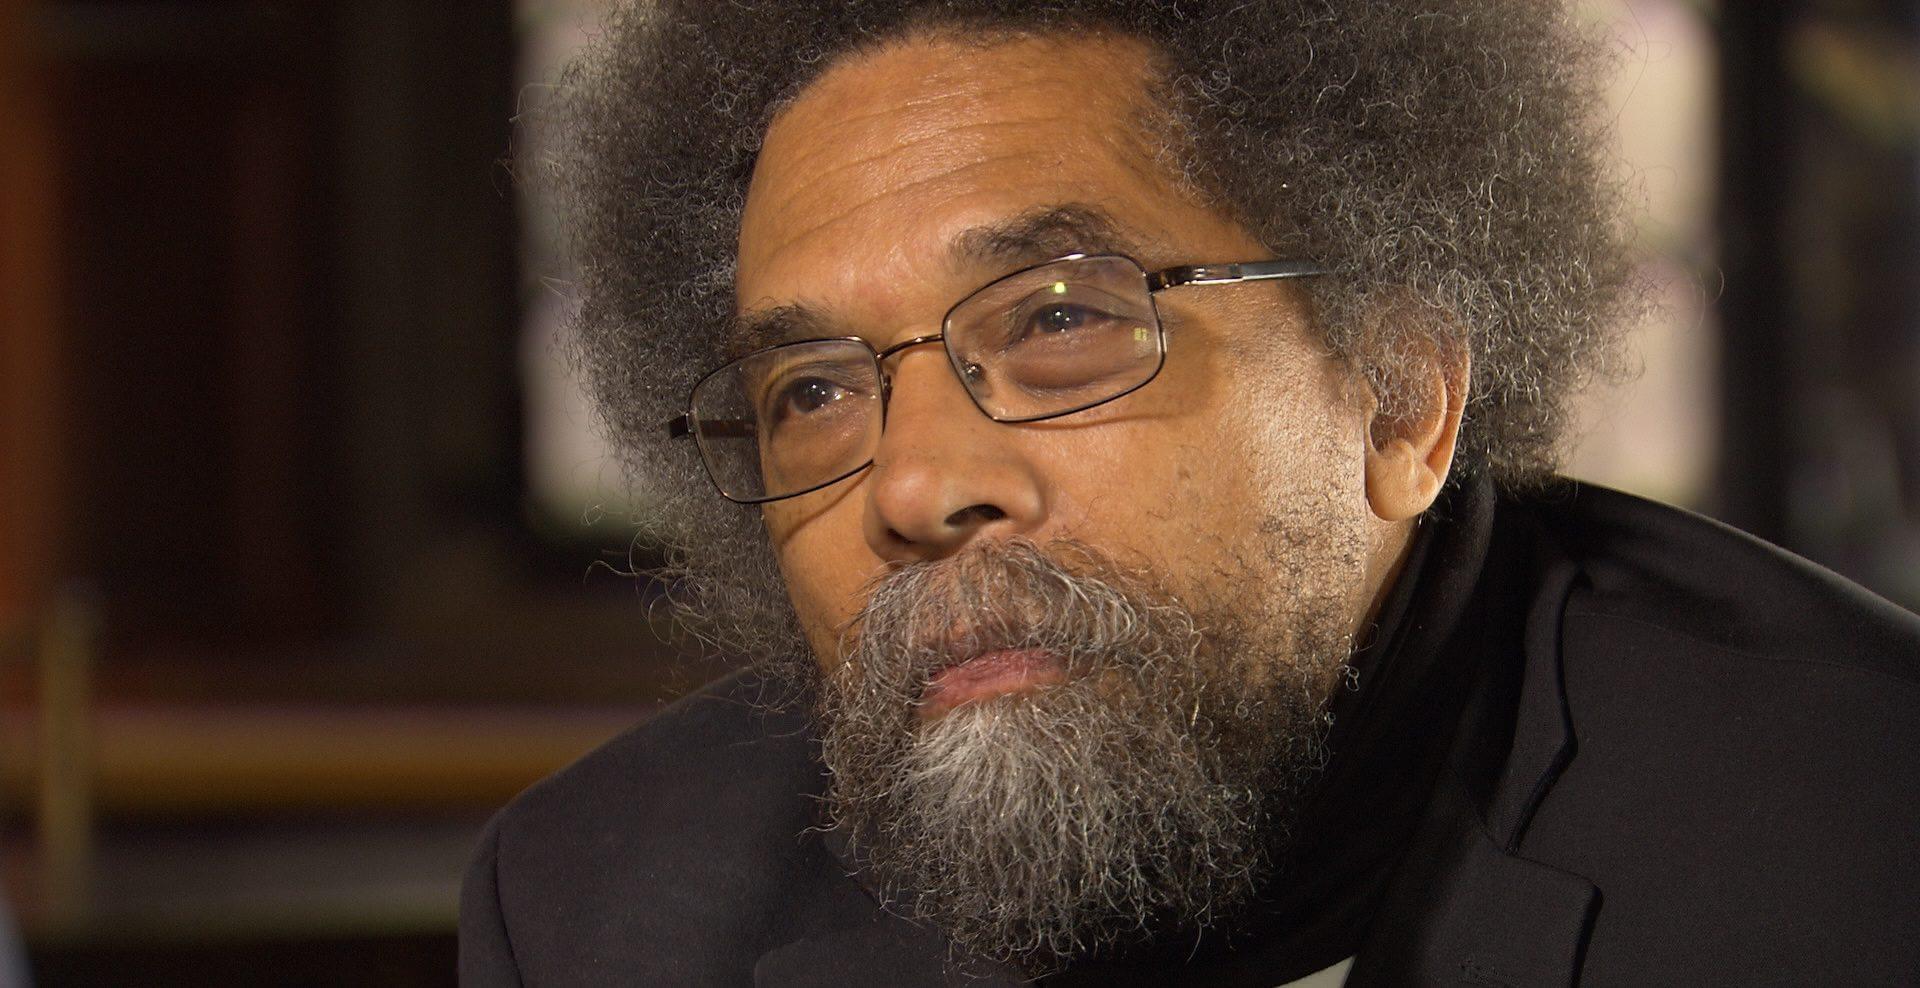 Cornel West publishes his Harvard resignation letter after tenure dispute